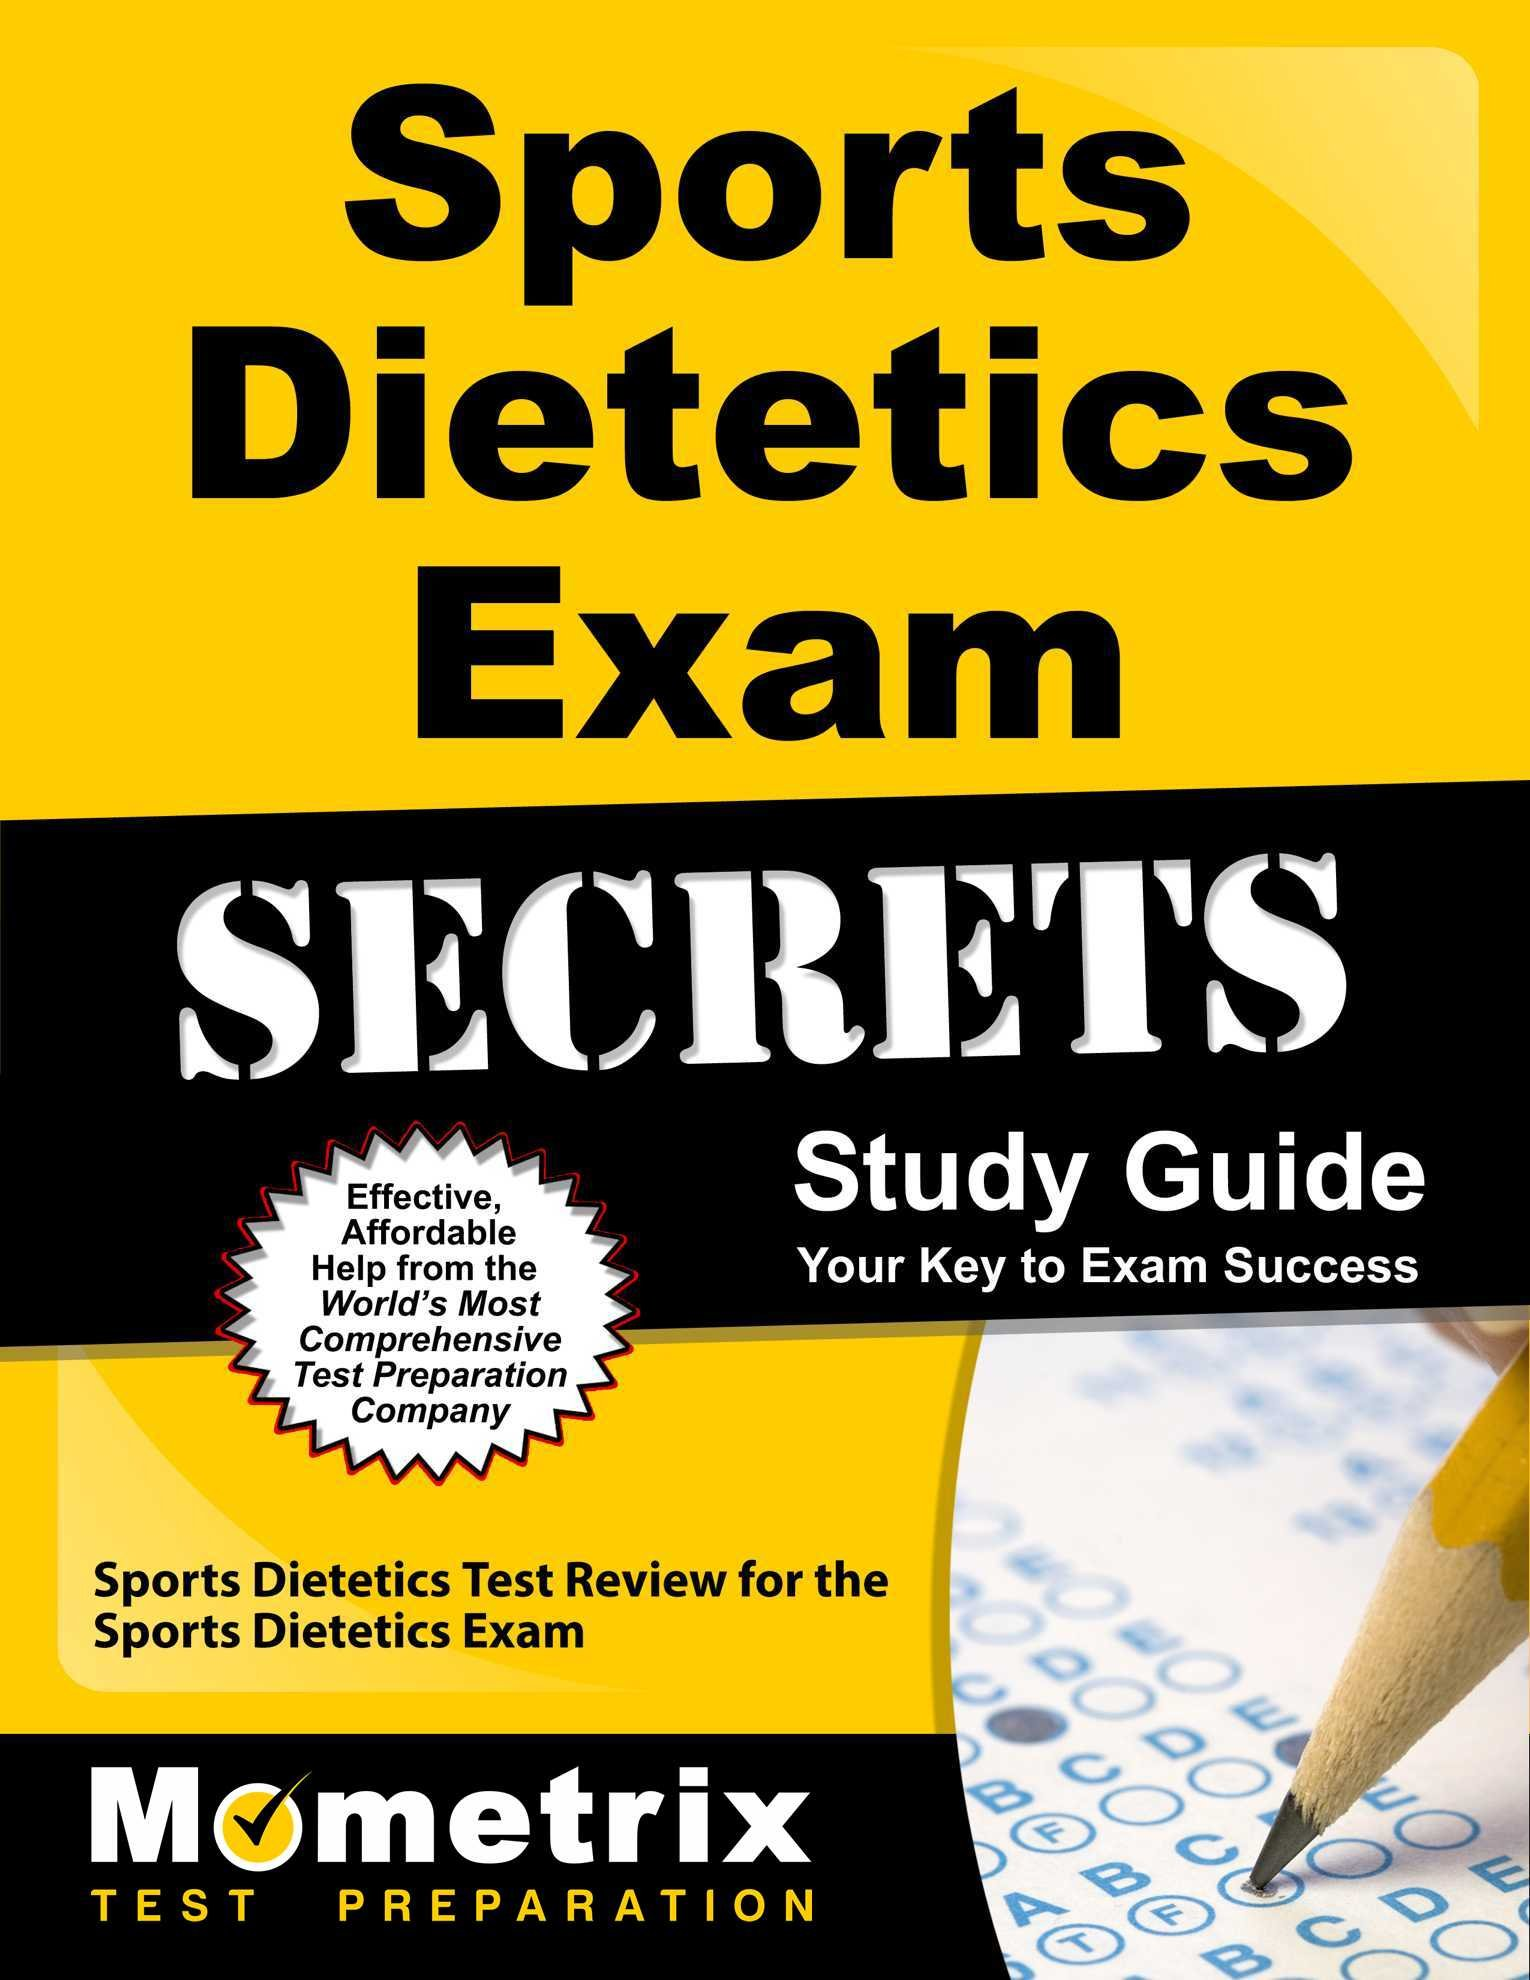 Sports Dietetics Exam Secrets Study Guide Secrets Mometrix: Amazon.co.uk:  Sports Dietetics Exam Secrets Test Prep: Books